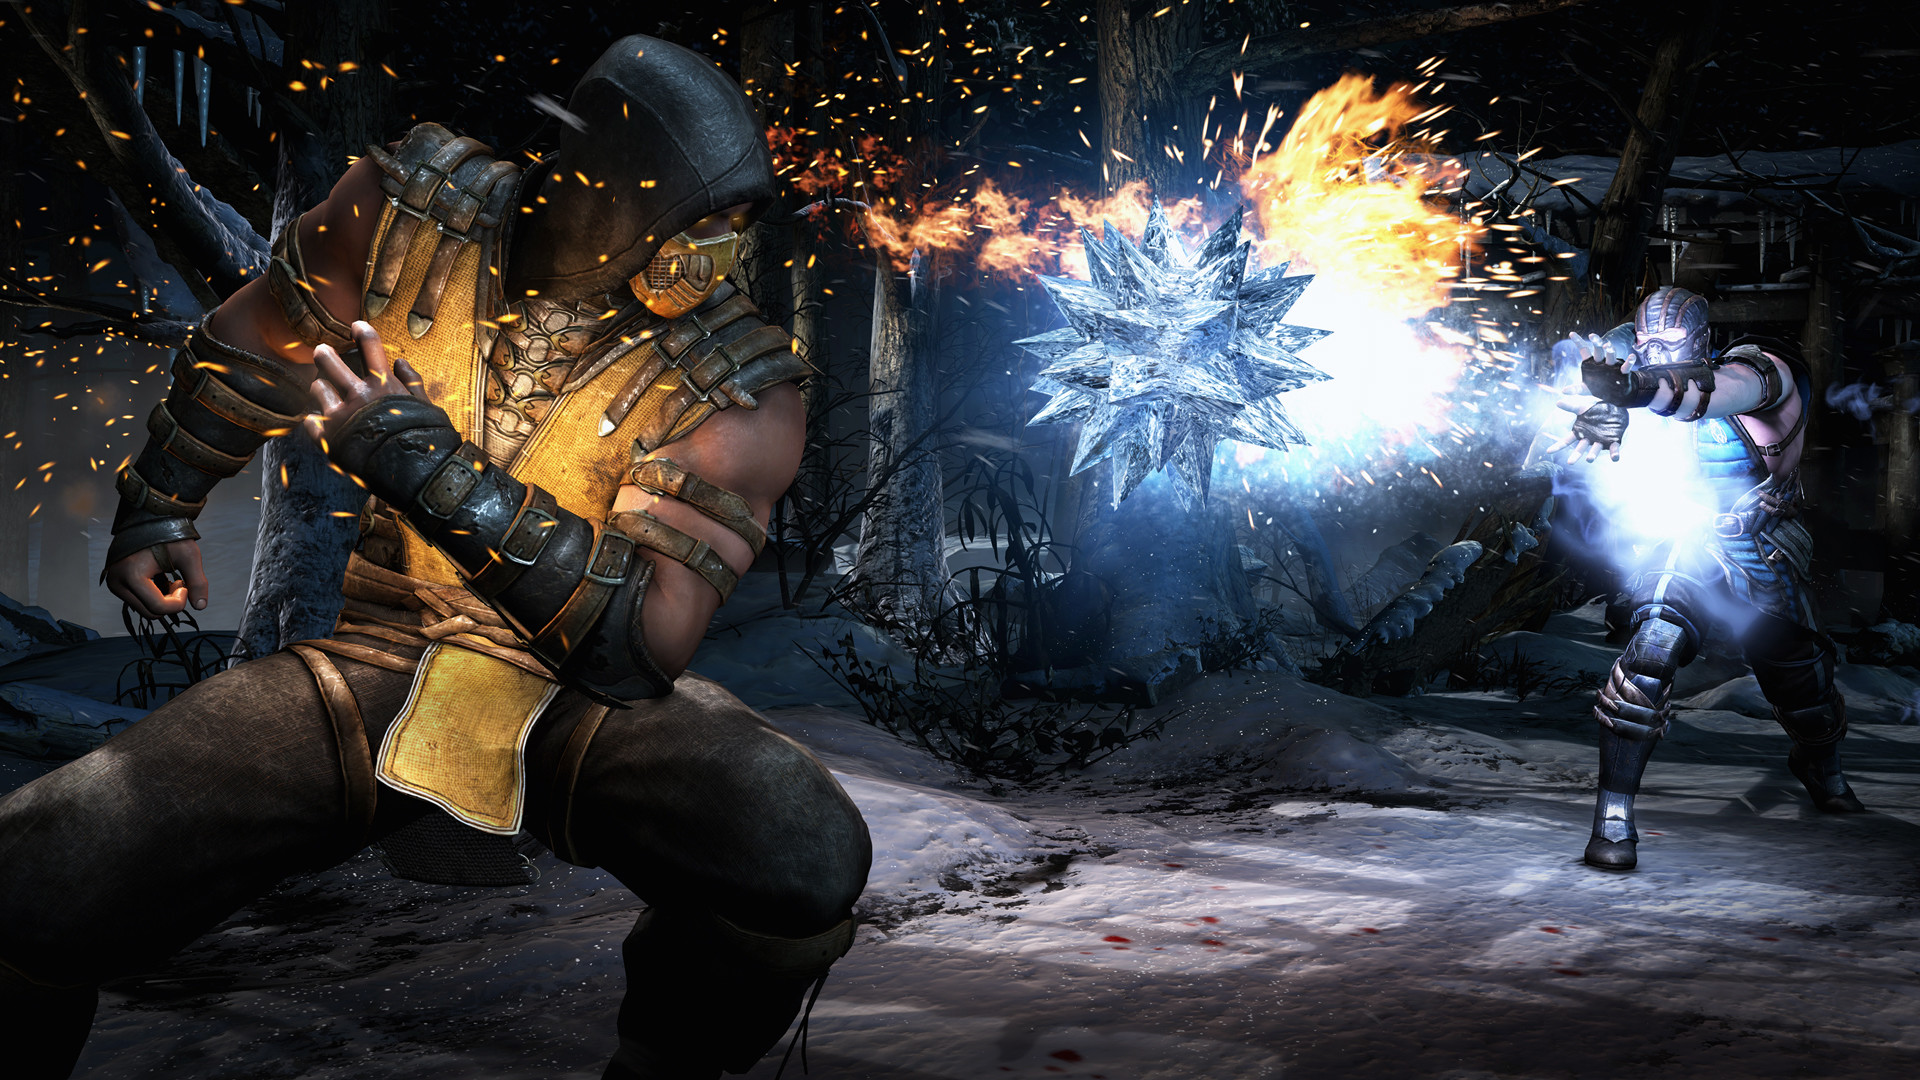 Scorpion vs Sub Zero HD Wallpaper. Fighting + Games + Mortal Kombat X